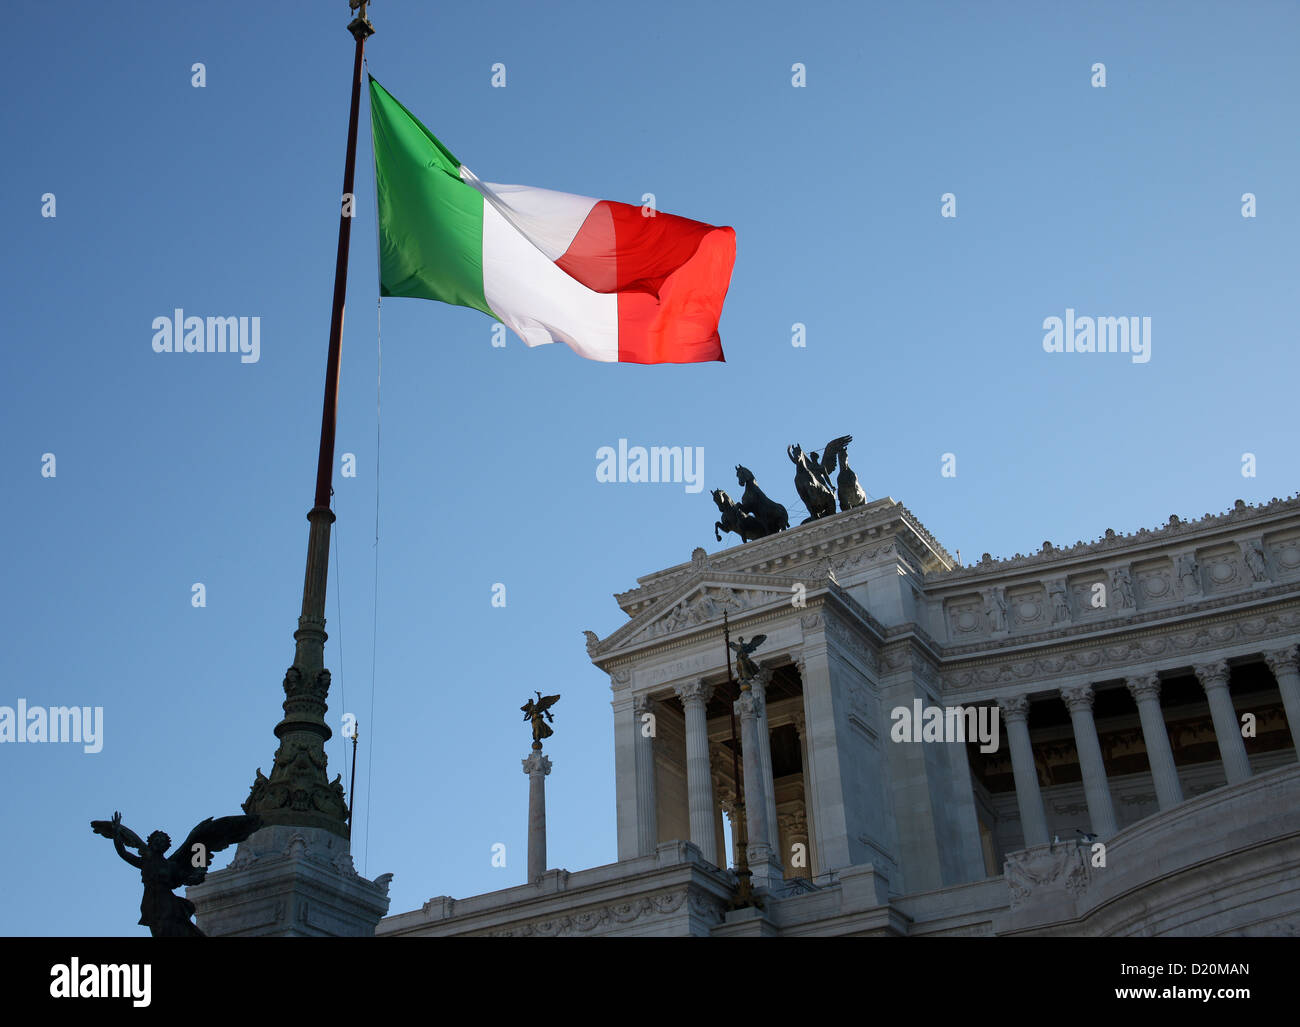 Italian flag at the Vittorio Emanuele Monument Rome Italy - Stock Image